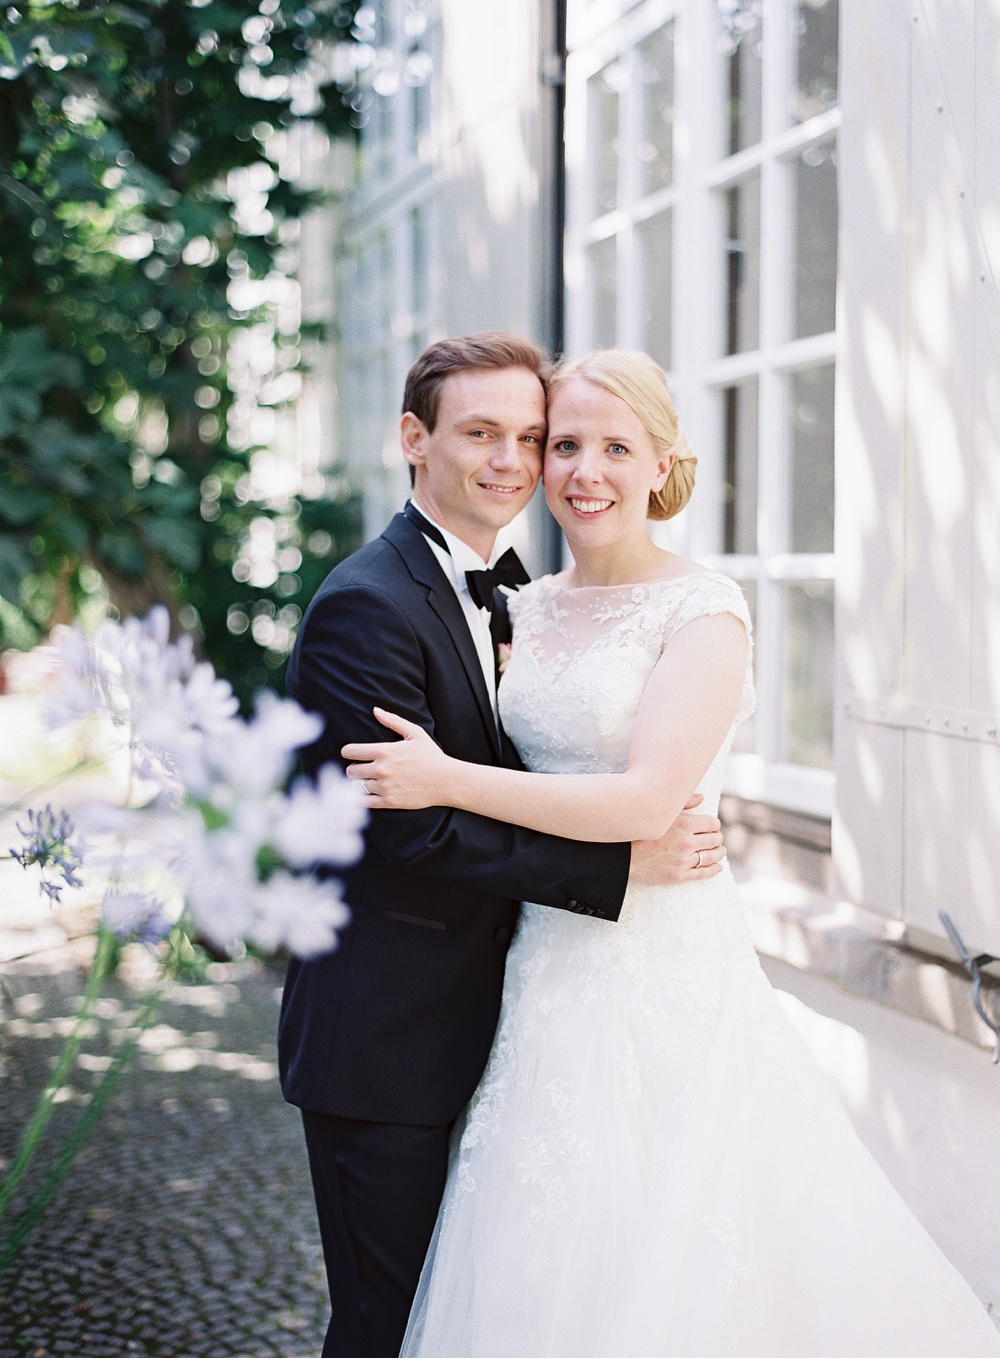 Classy_Norwegian_Wedding_WeddingPhotographer©MadalinaSheldon_0015.jpg